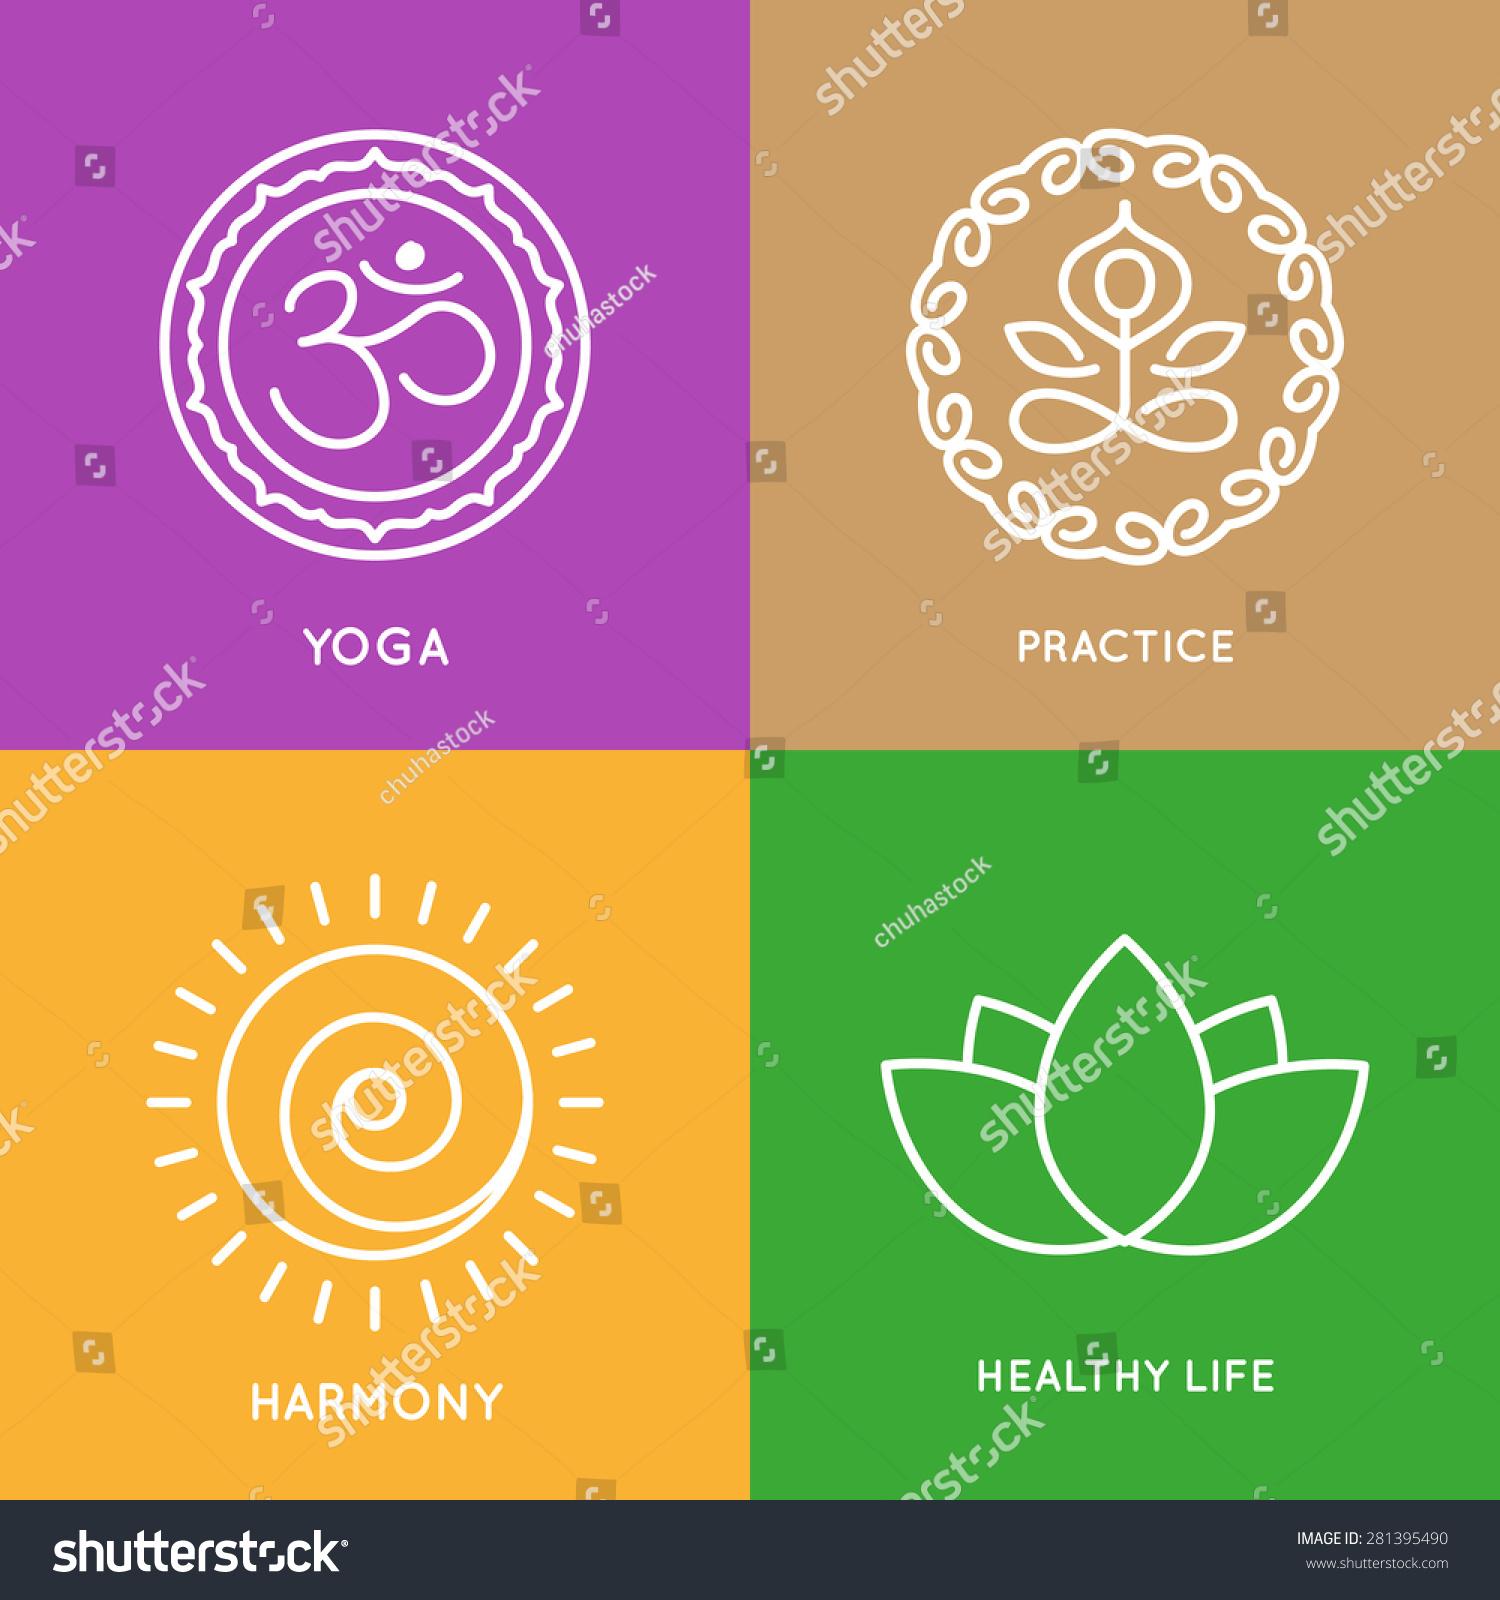 Graphic Design Elements Line : Yoga line symbols colorful squares vector stock